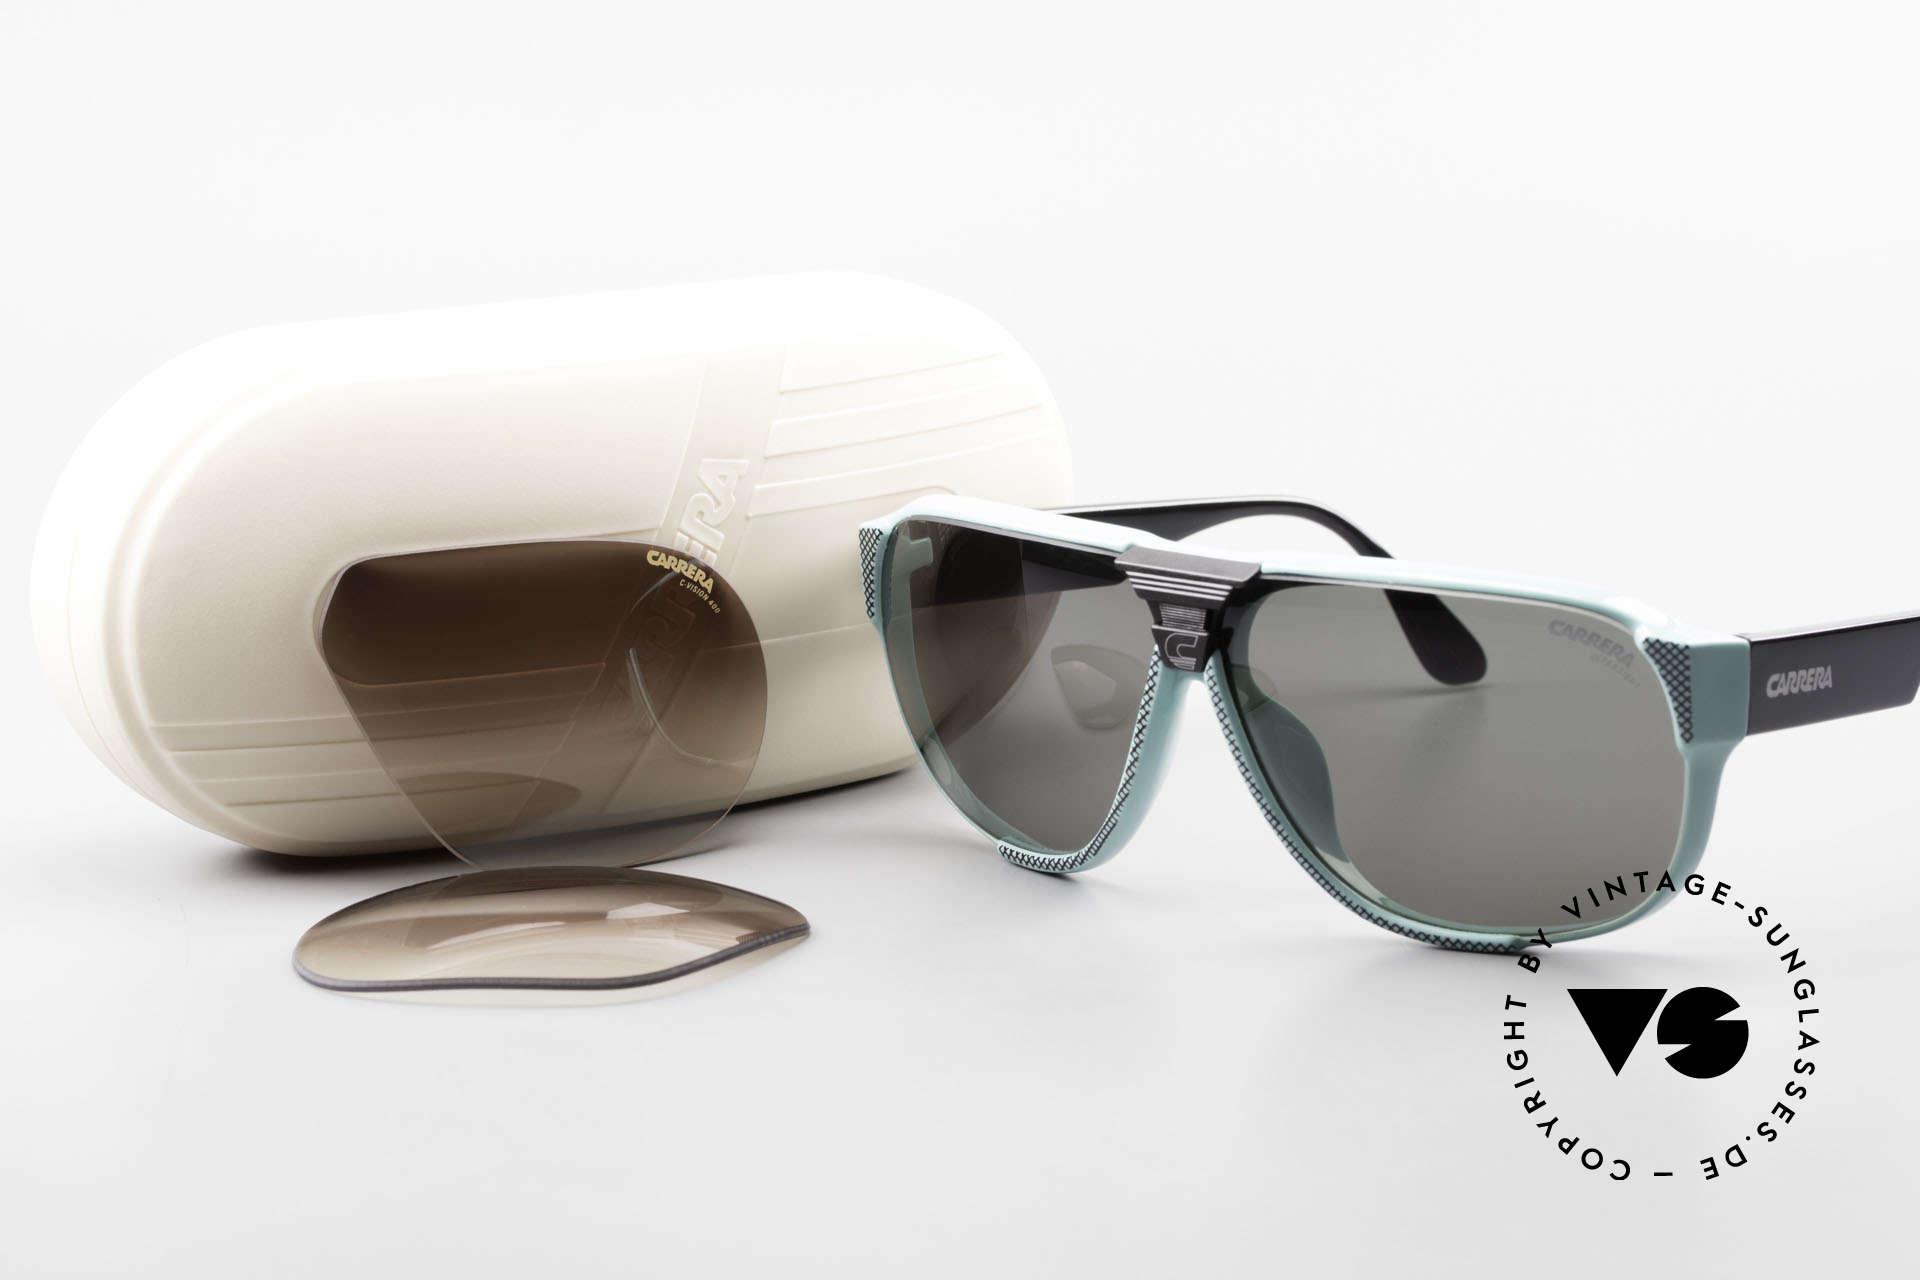 Carrera 5431 80's Vintage Sports Sunglasses, Size: medium, Made for Men